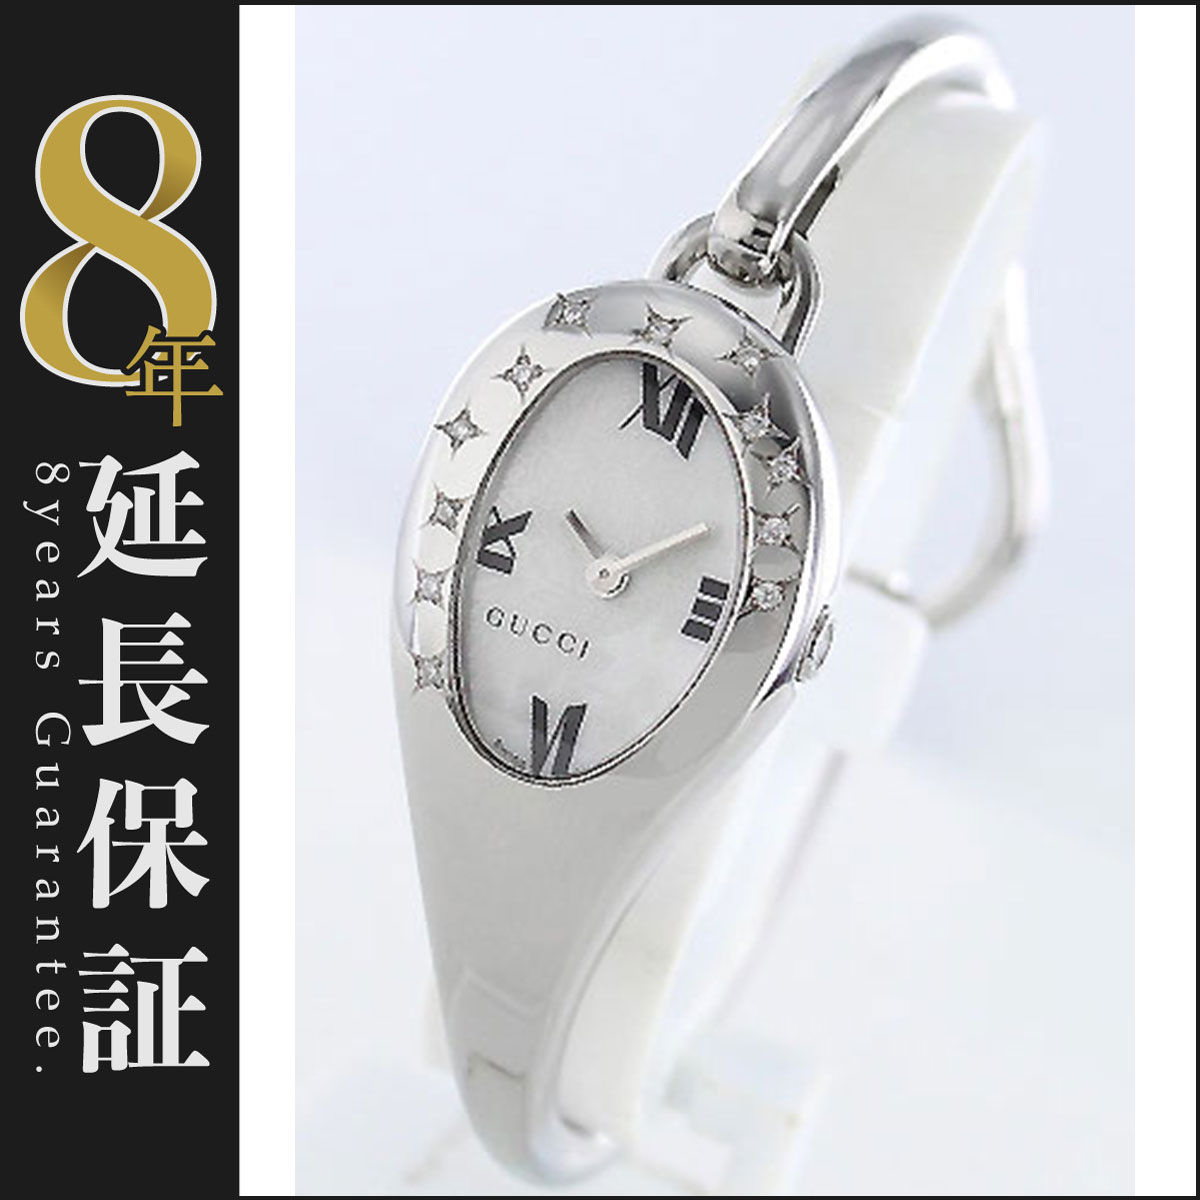 21a4e3bc77ba レディース 時計 オススメ 記念日 ブランド GUCCI おしゃれ 腕時計 グッチ時計 高級 YA112503 誕生日 クリスマス